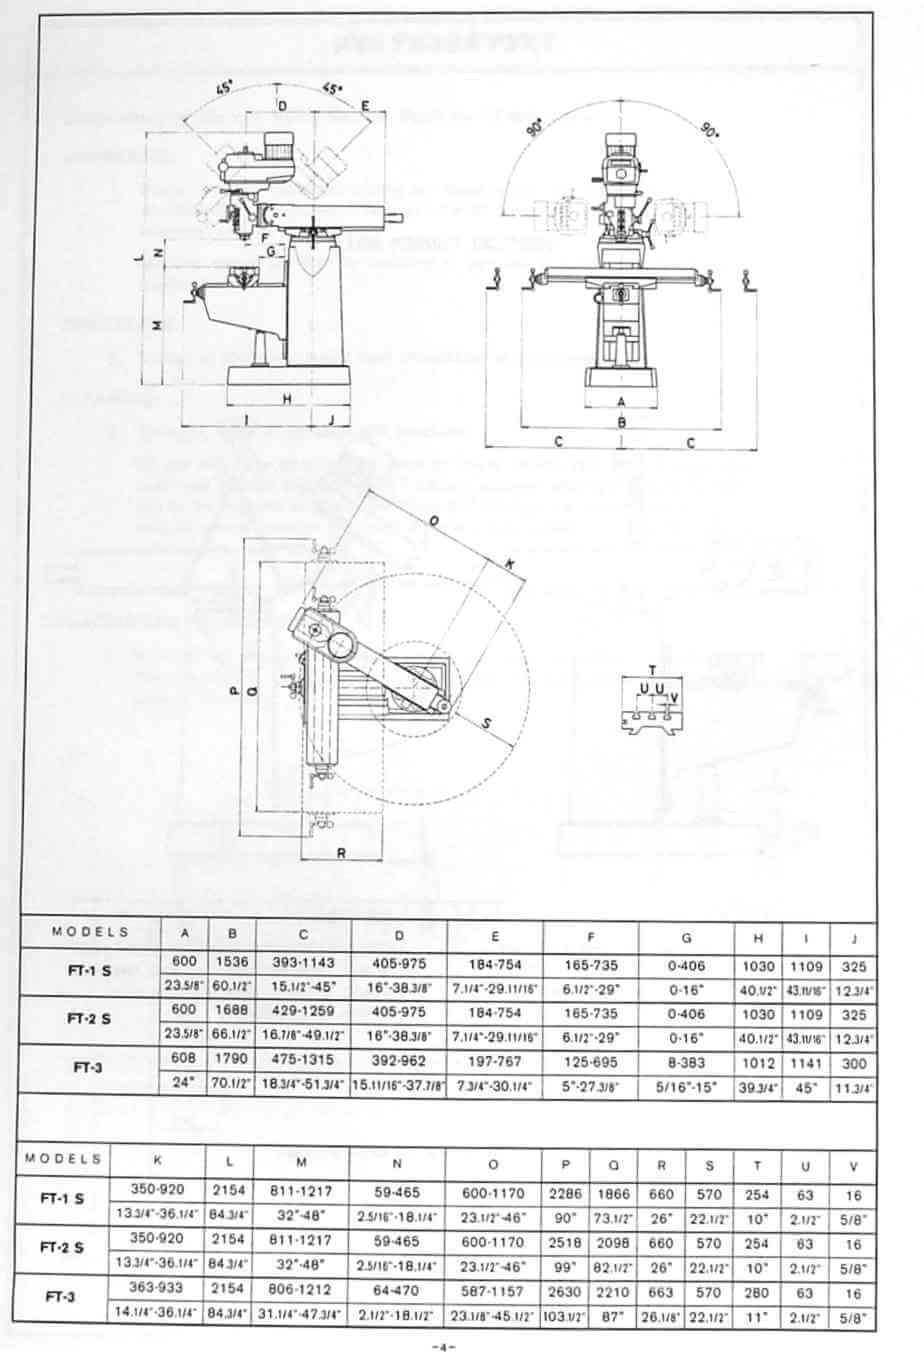 LAGUN FTV-1S FTV-2S FTV-3S Vertical Milling Machine